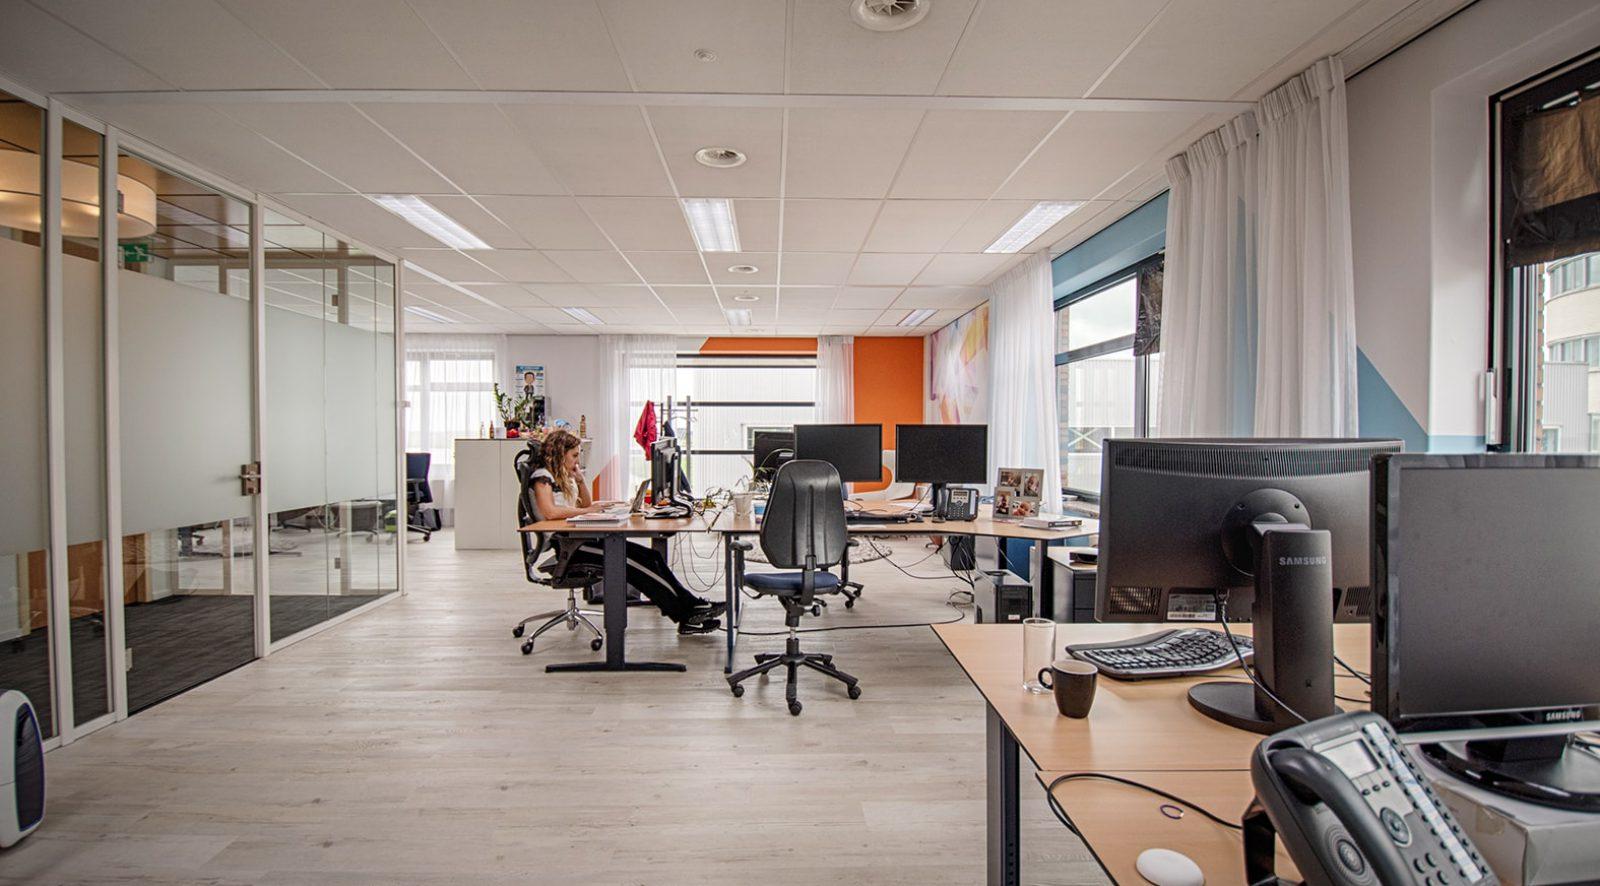 Kantoorruimte te huur in Bodegraven | Crown Business Center Bodegraven